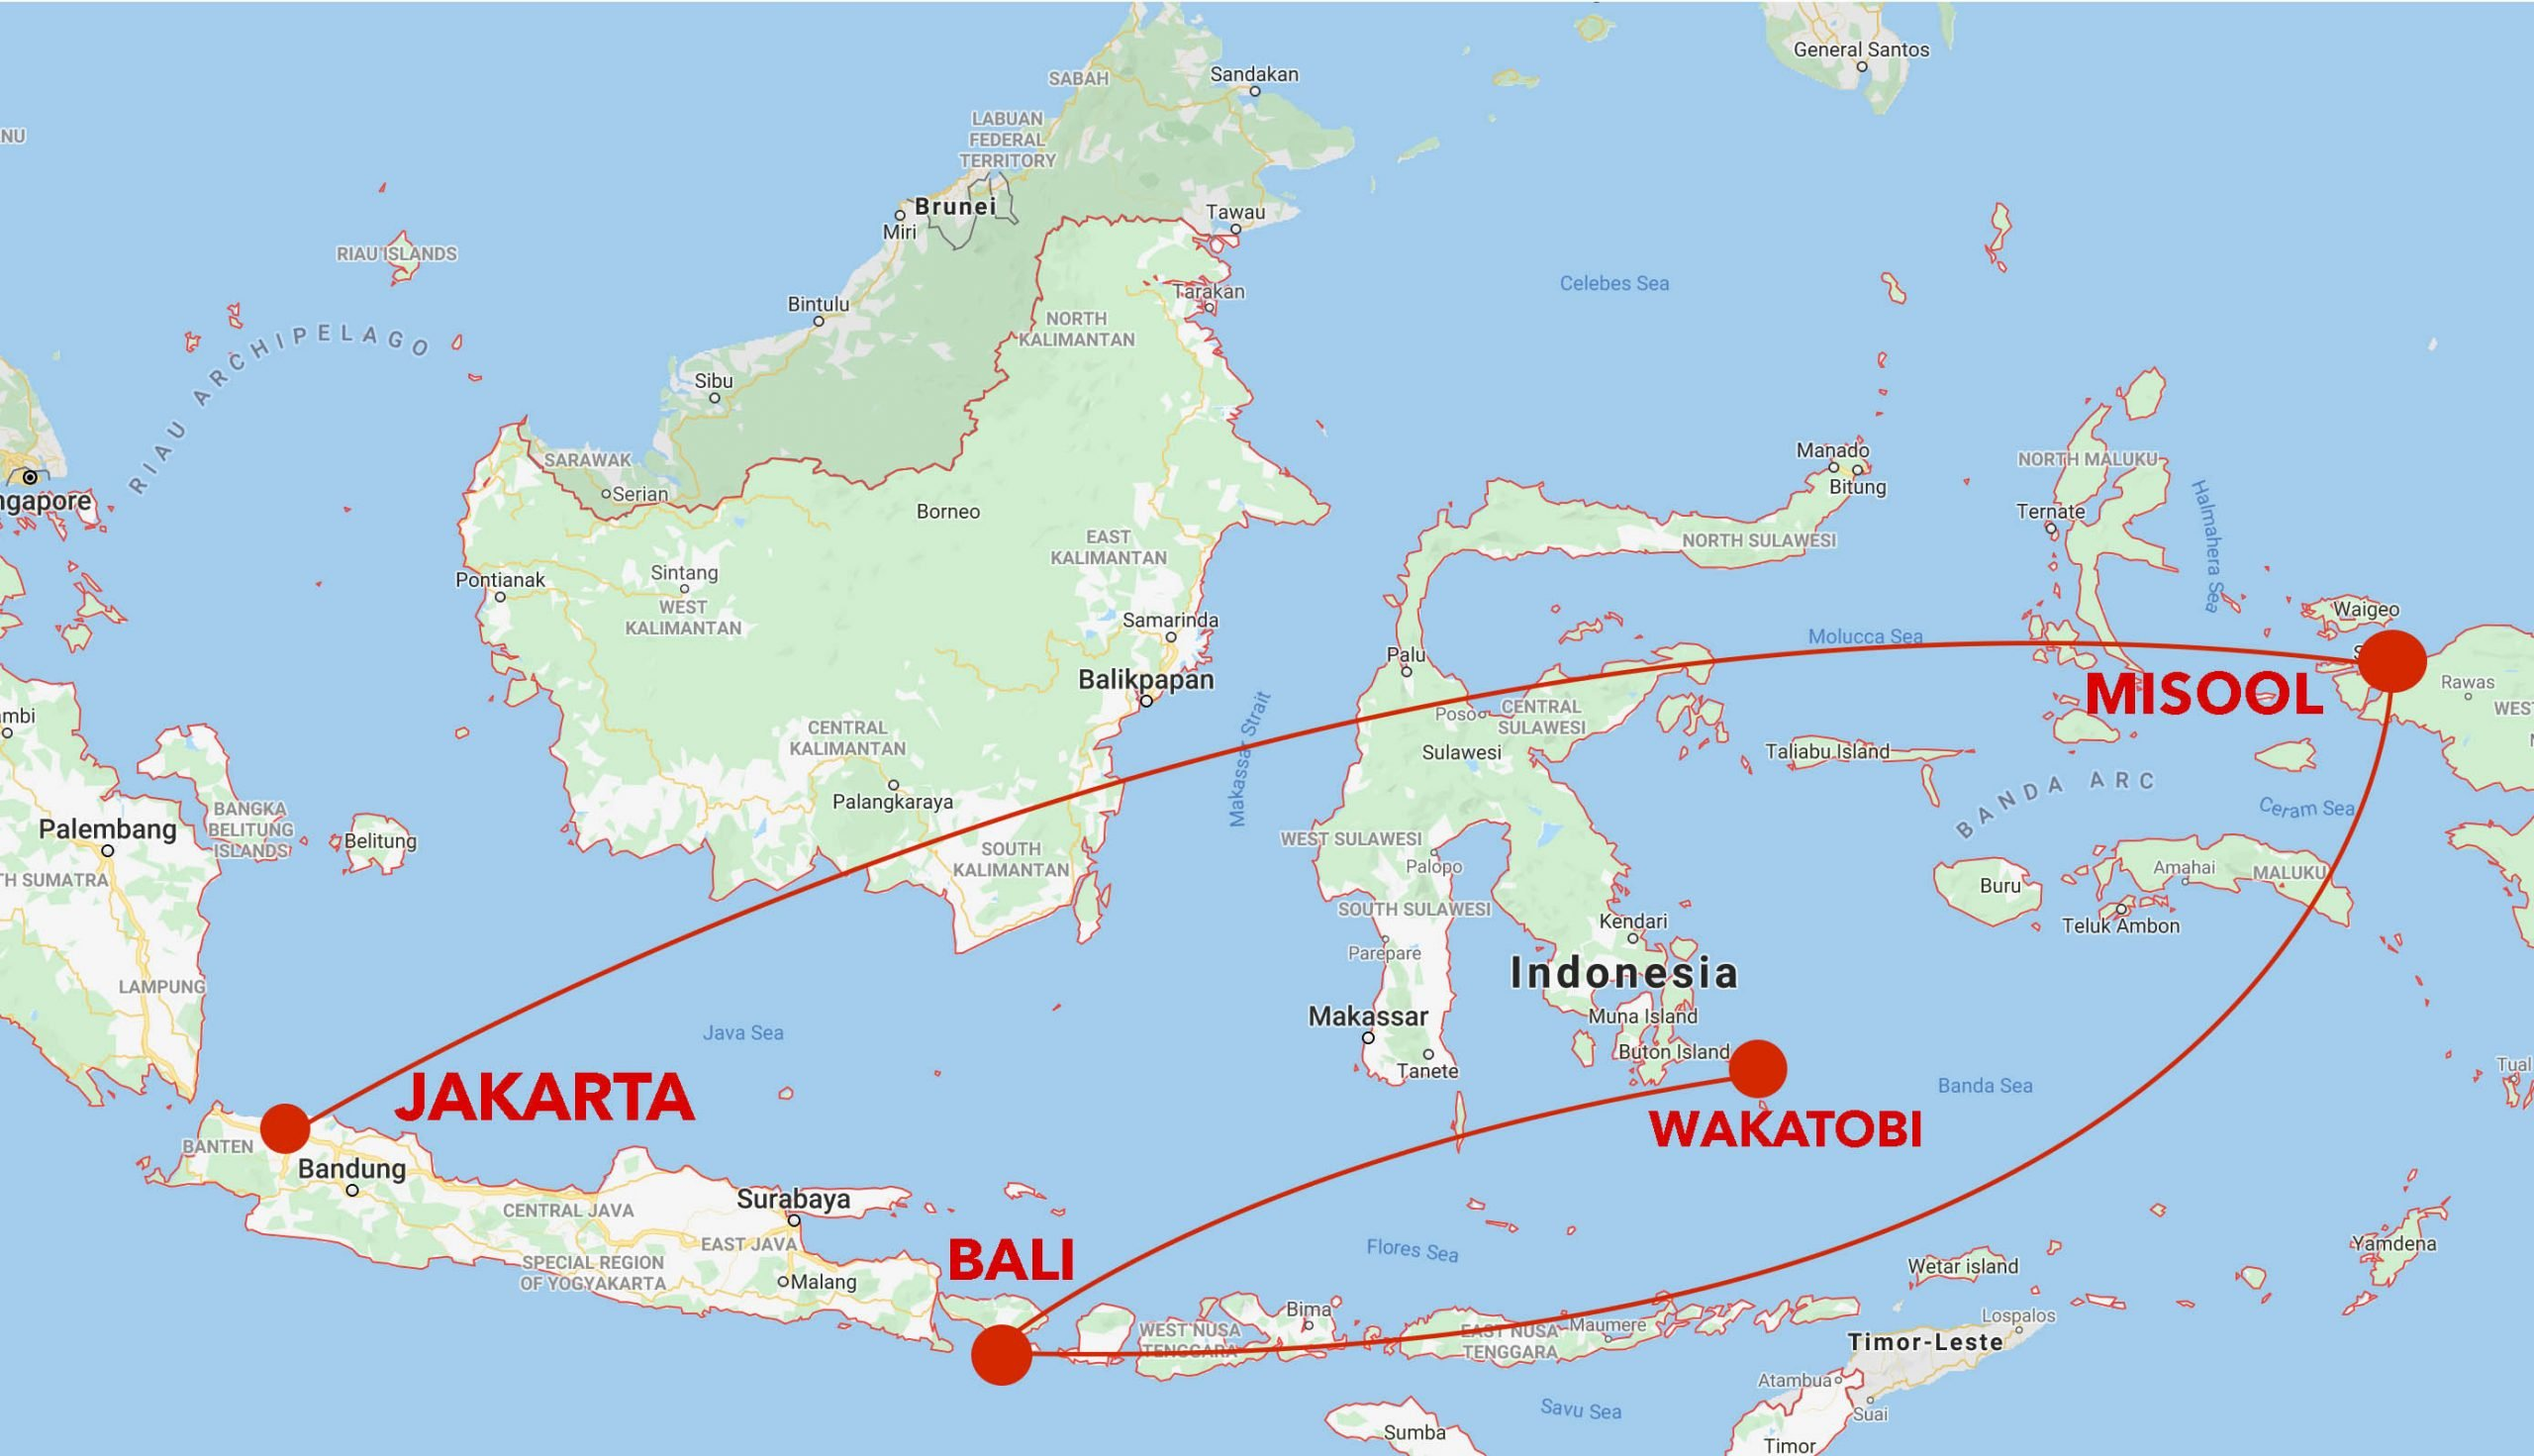 Misool to Wakatobi snorkel safari map